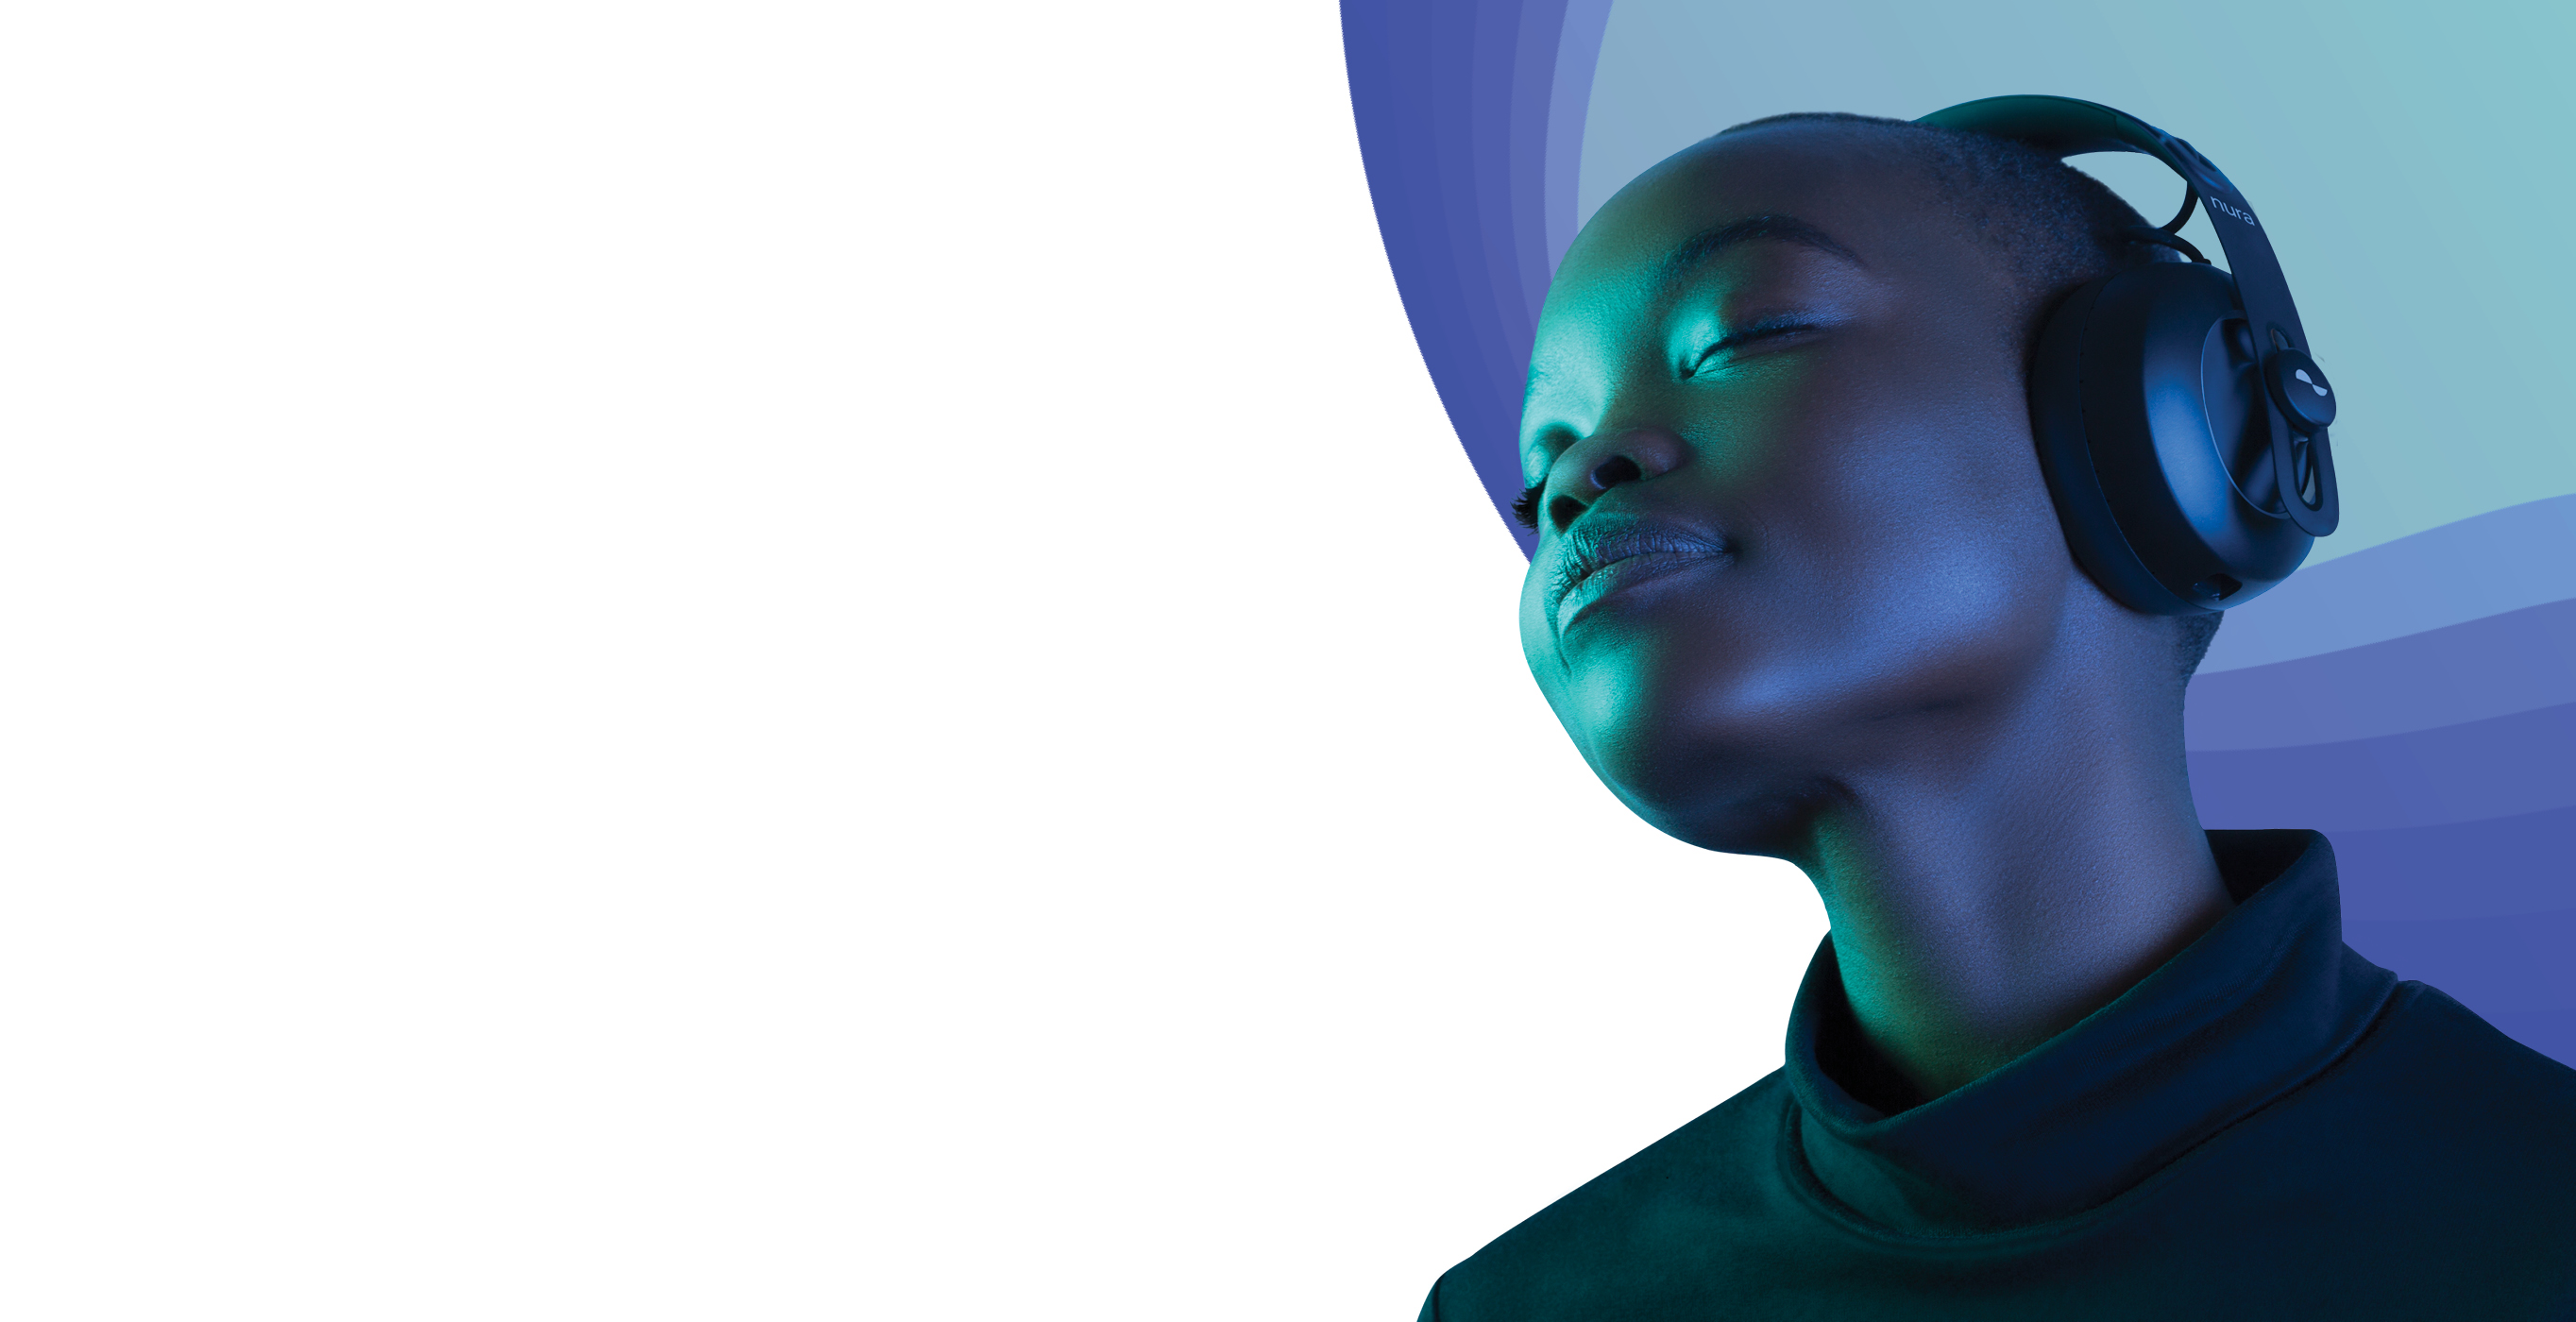 Nuraphone G2 Music In Full Colour Personalized Sound